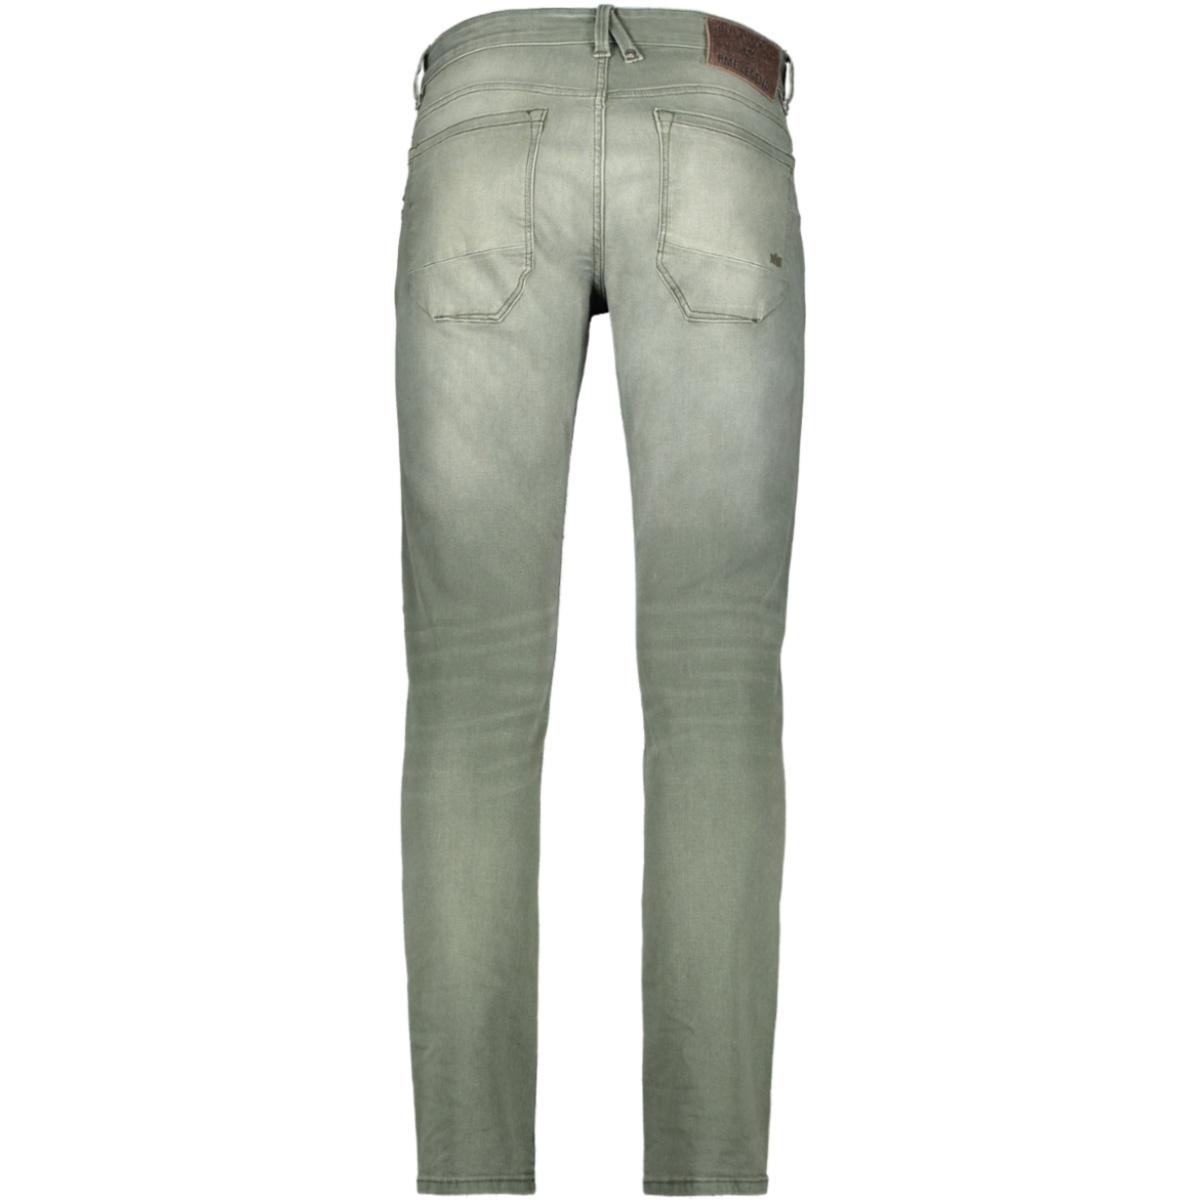 nightflight pants ptr201621 pme legend jeans 6149